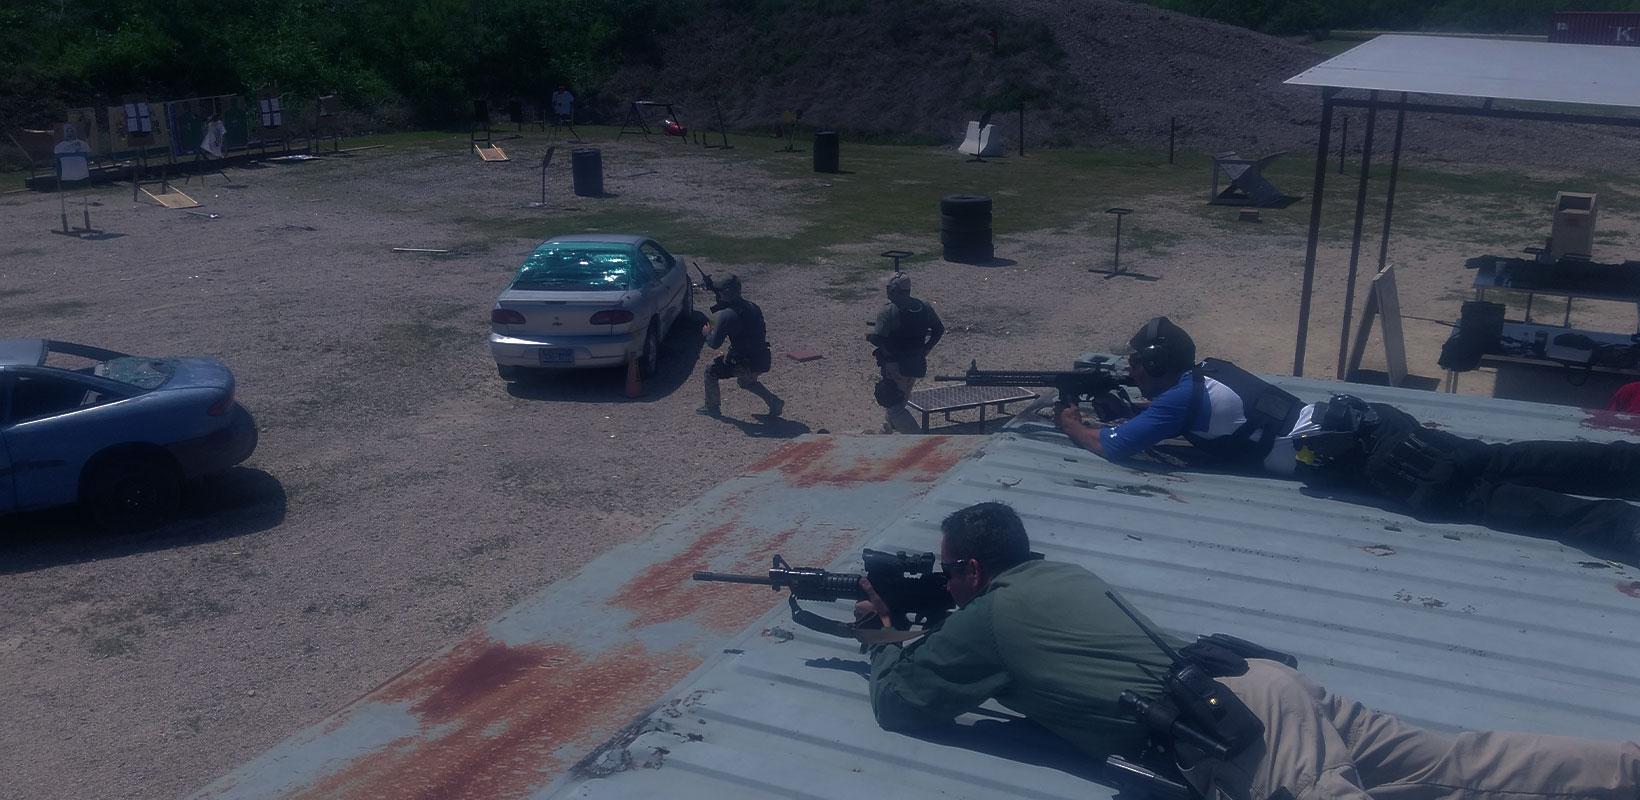 tactical-pistol-and-rifleRDI